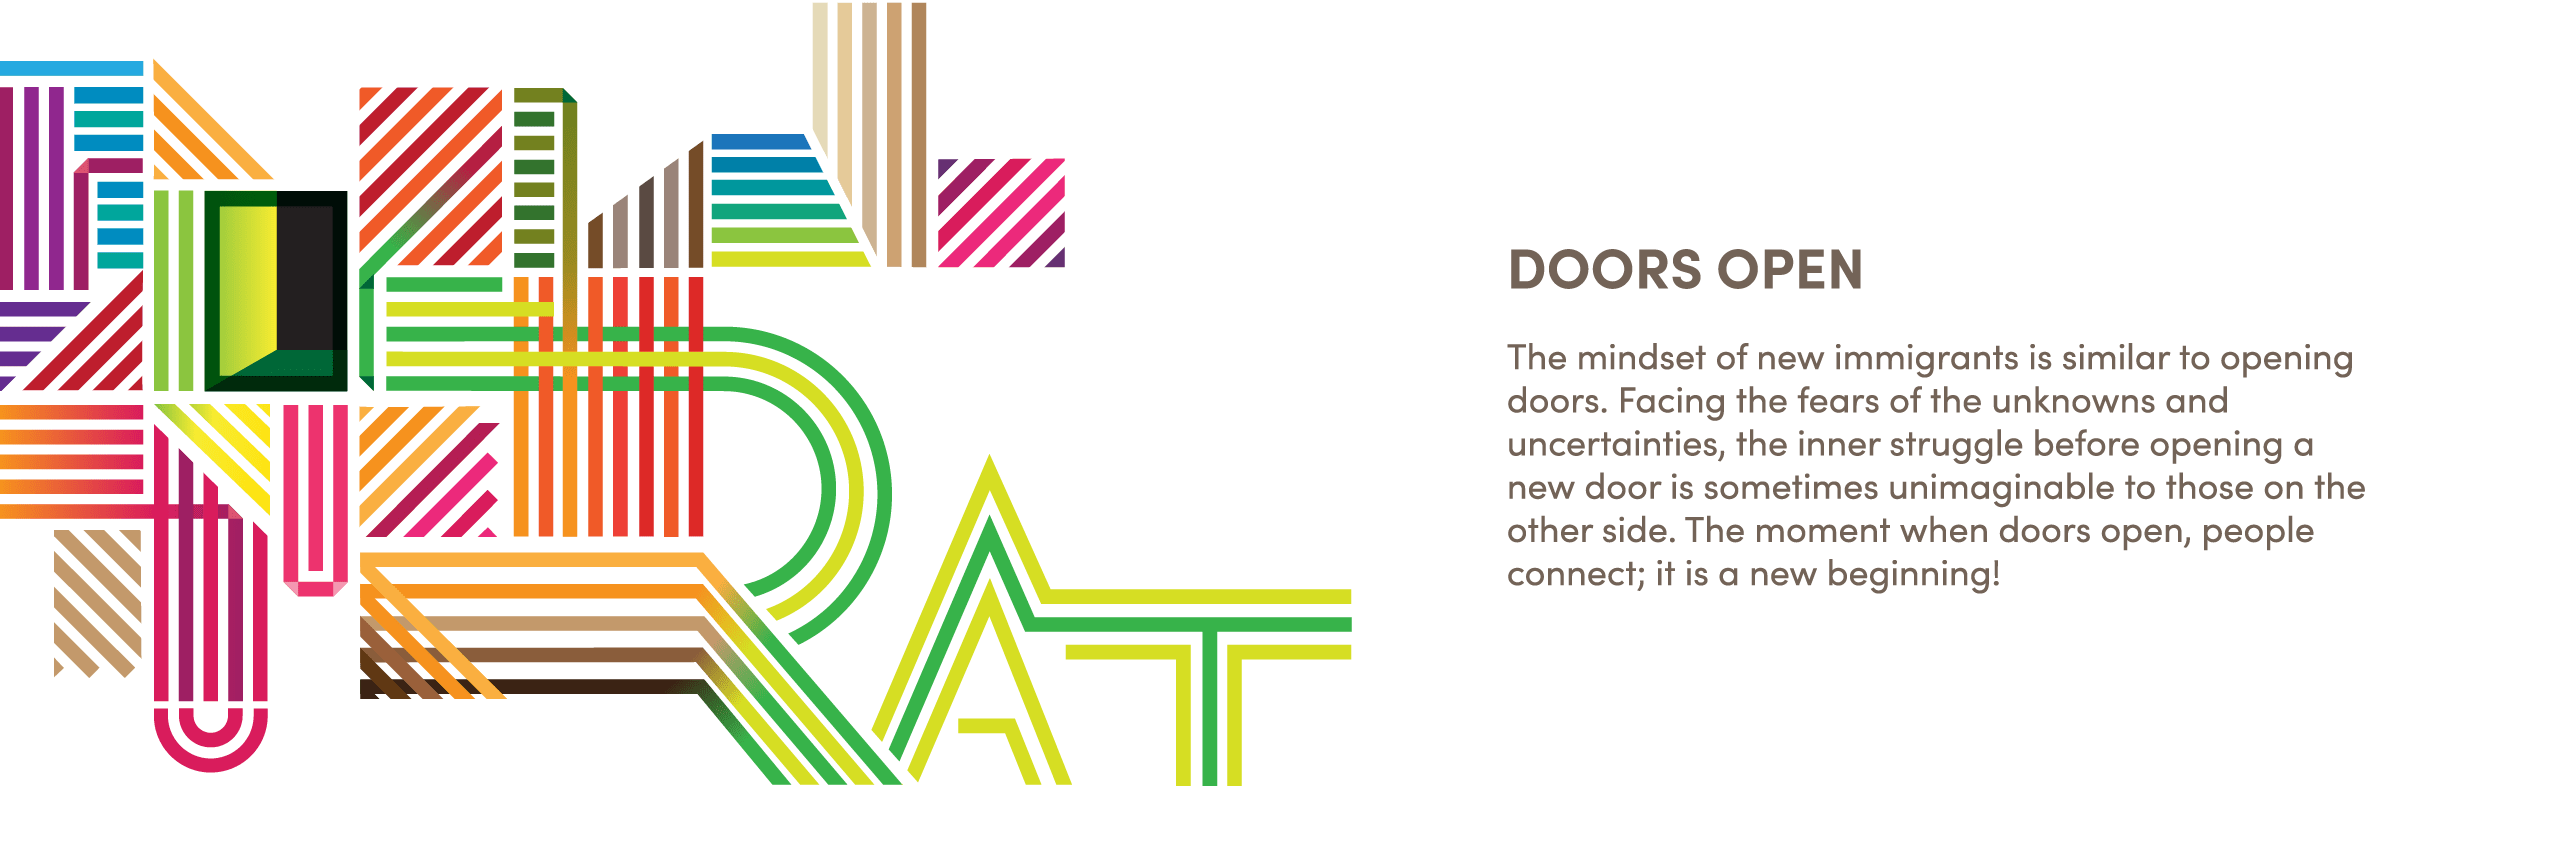 2020 LunarFest Theme Image - Doors Open